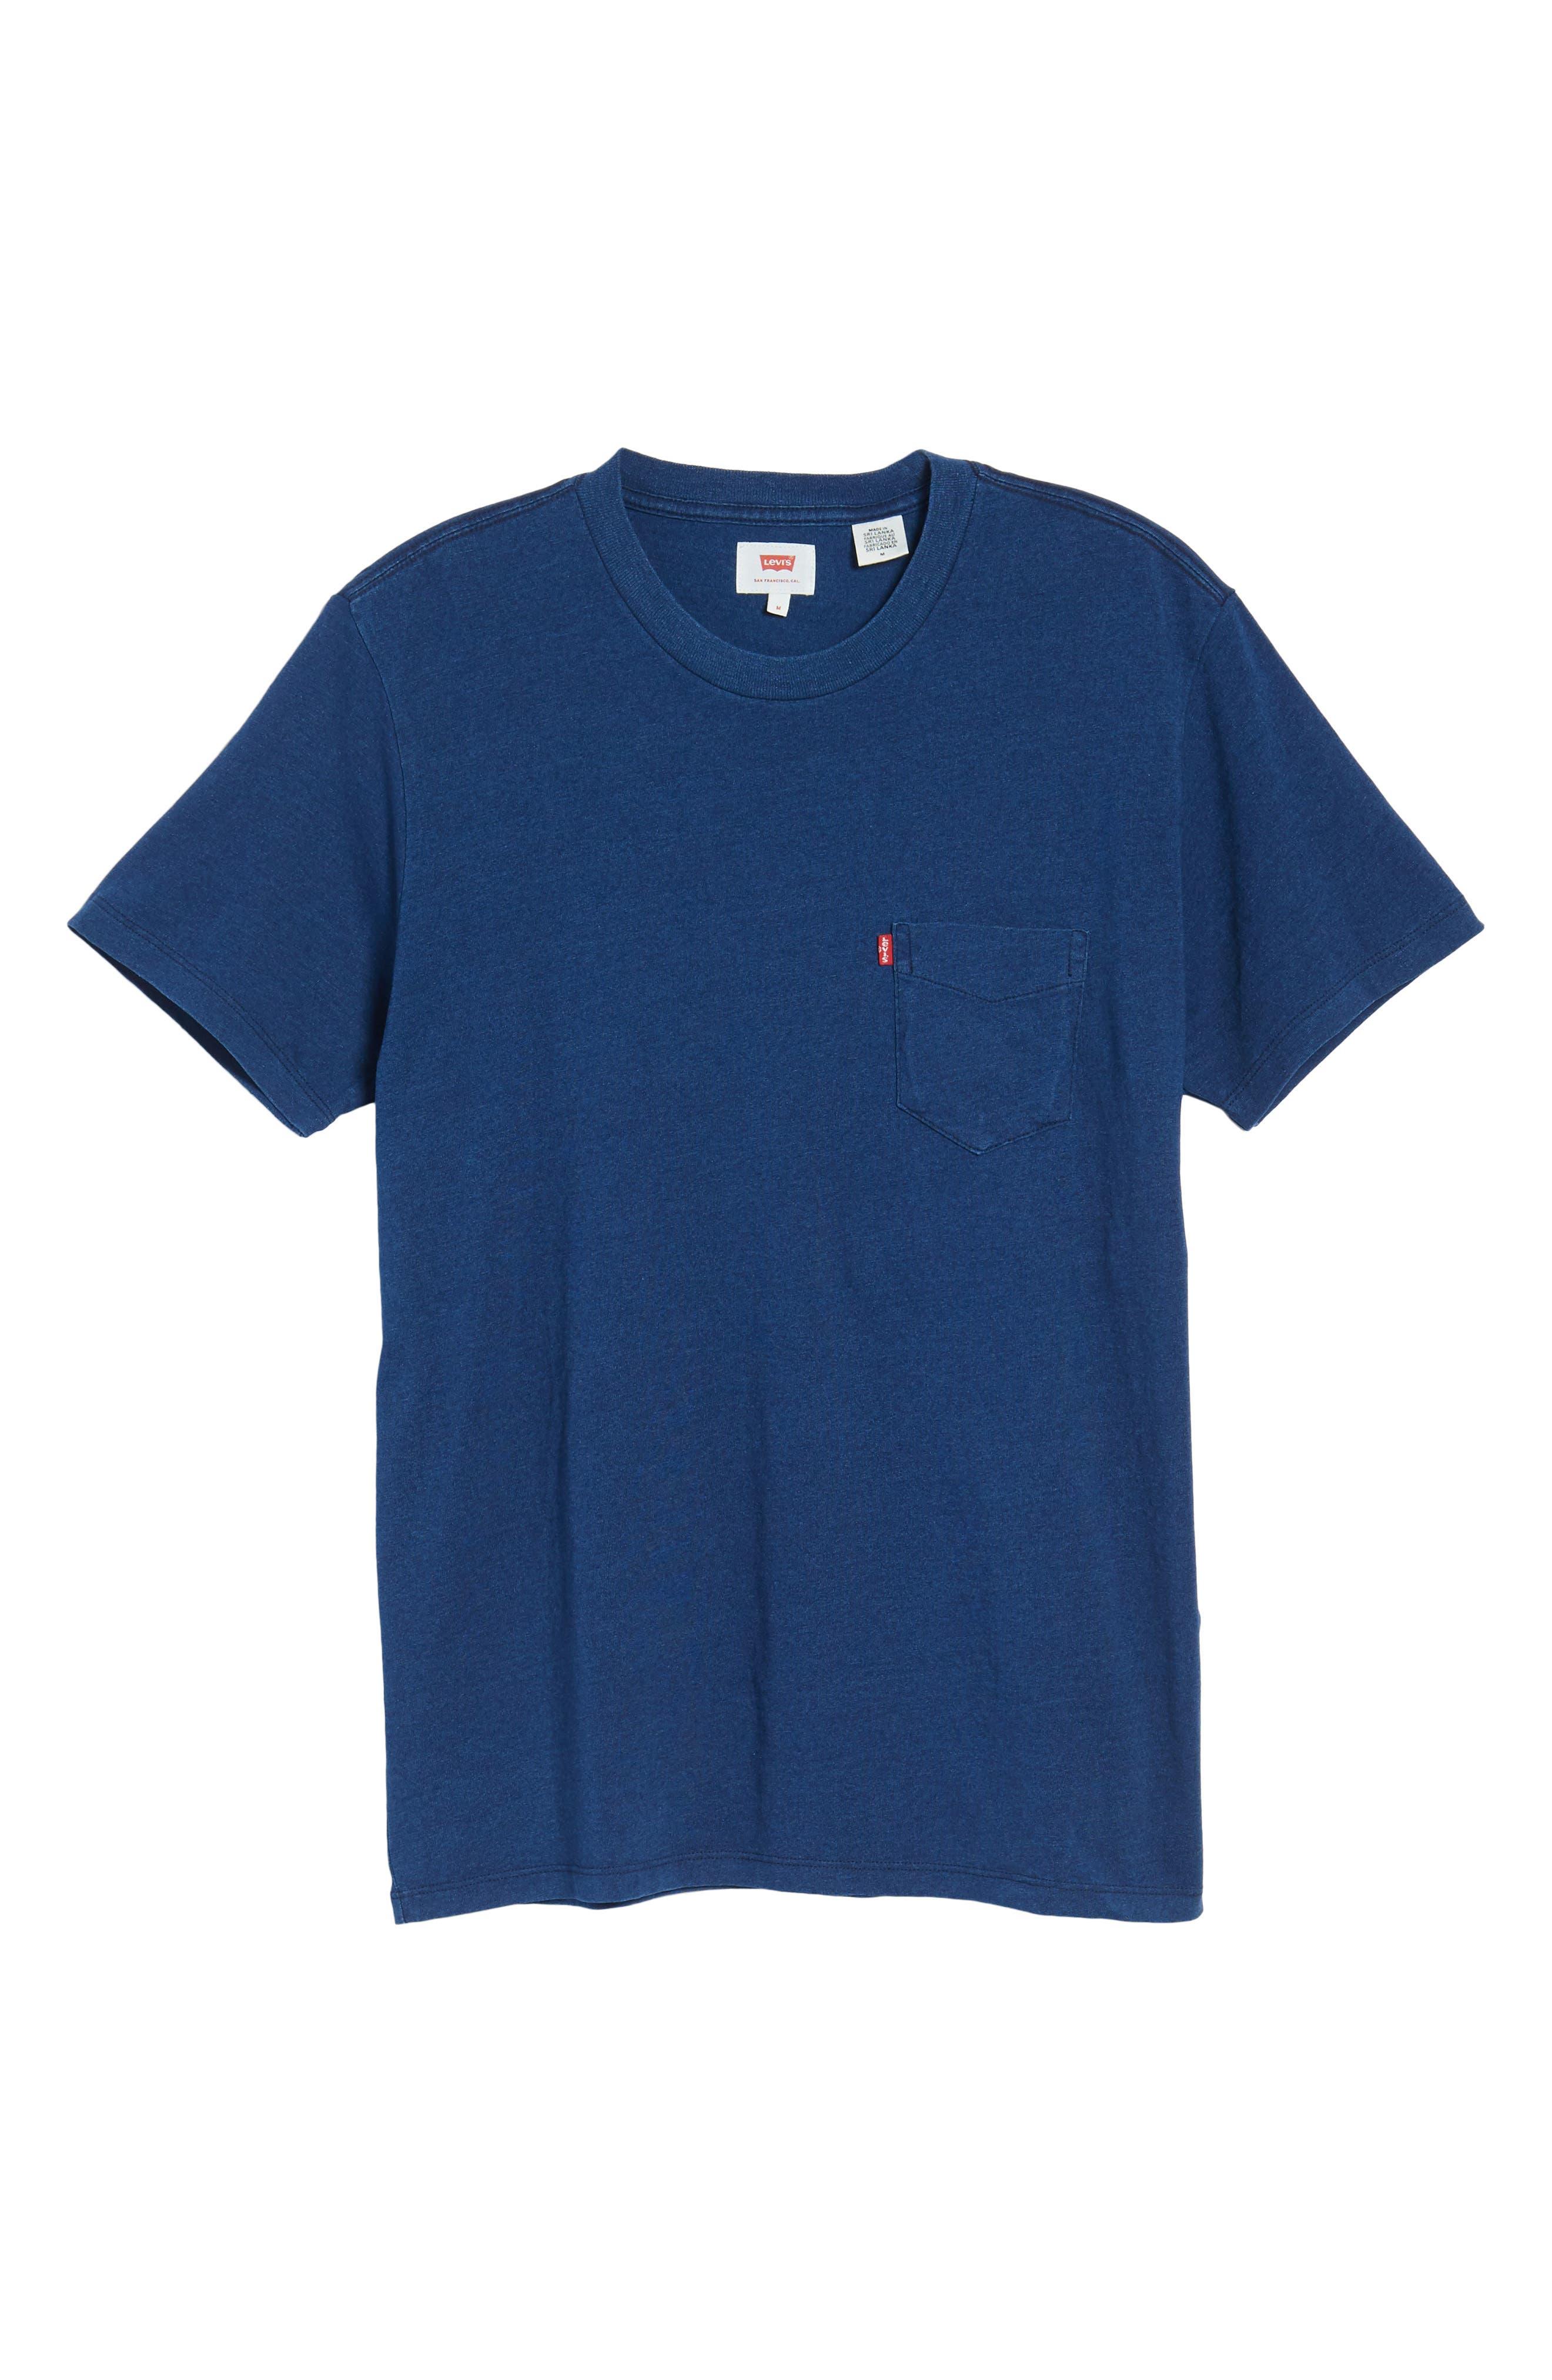 Pocket T-Shirt,                             Alternate thumbnail 6, color,                             Medium Indigo Xx